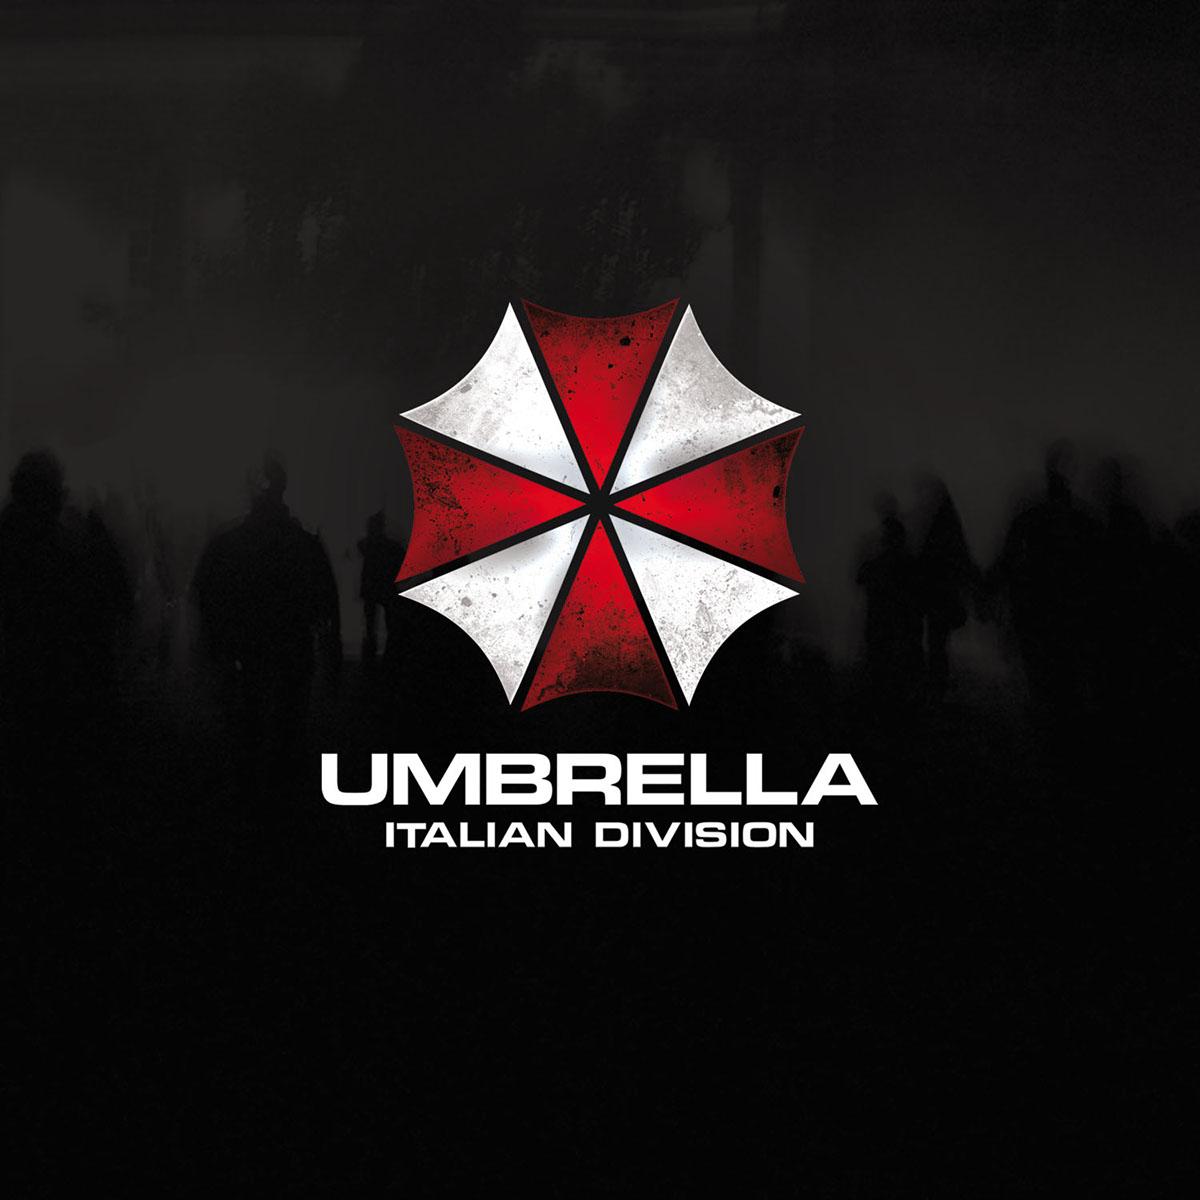 Umbrella zombie horror Show Performance entertainmant apocalyptic virus Outbreak costuming